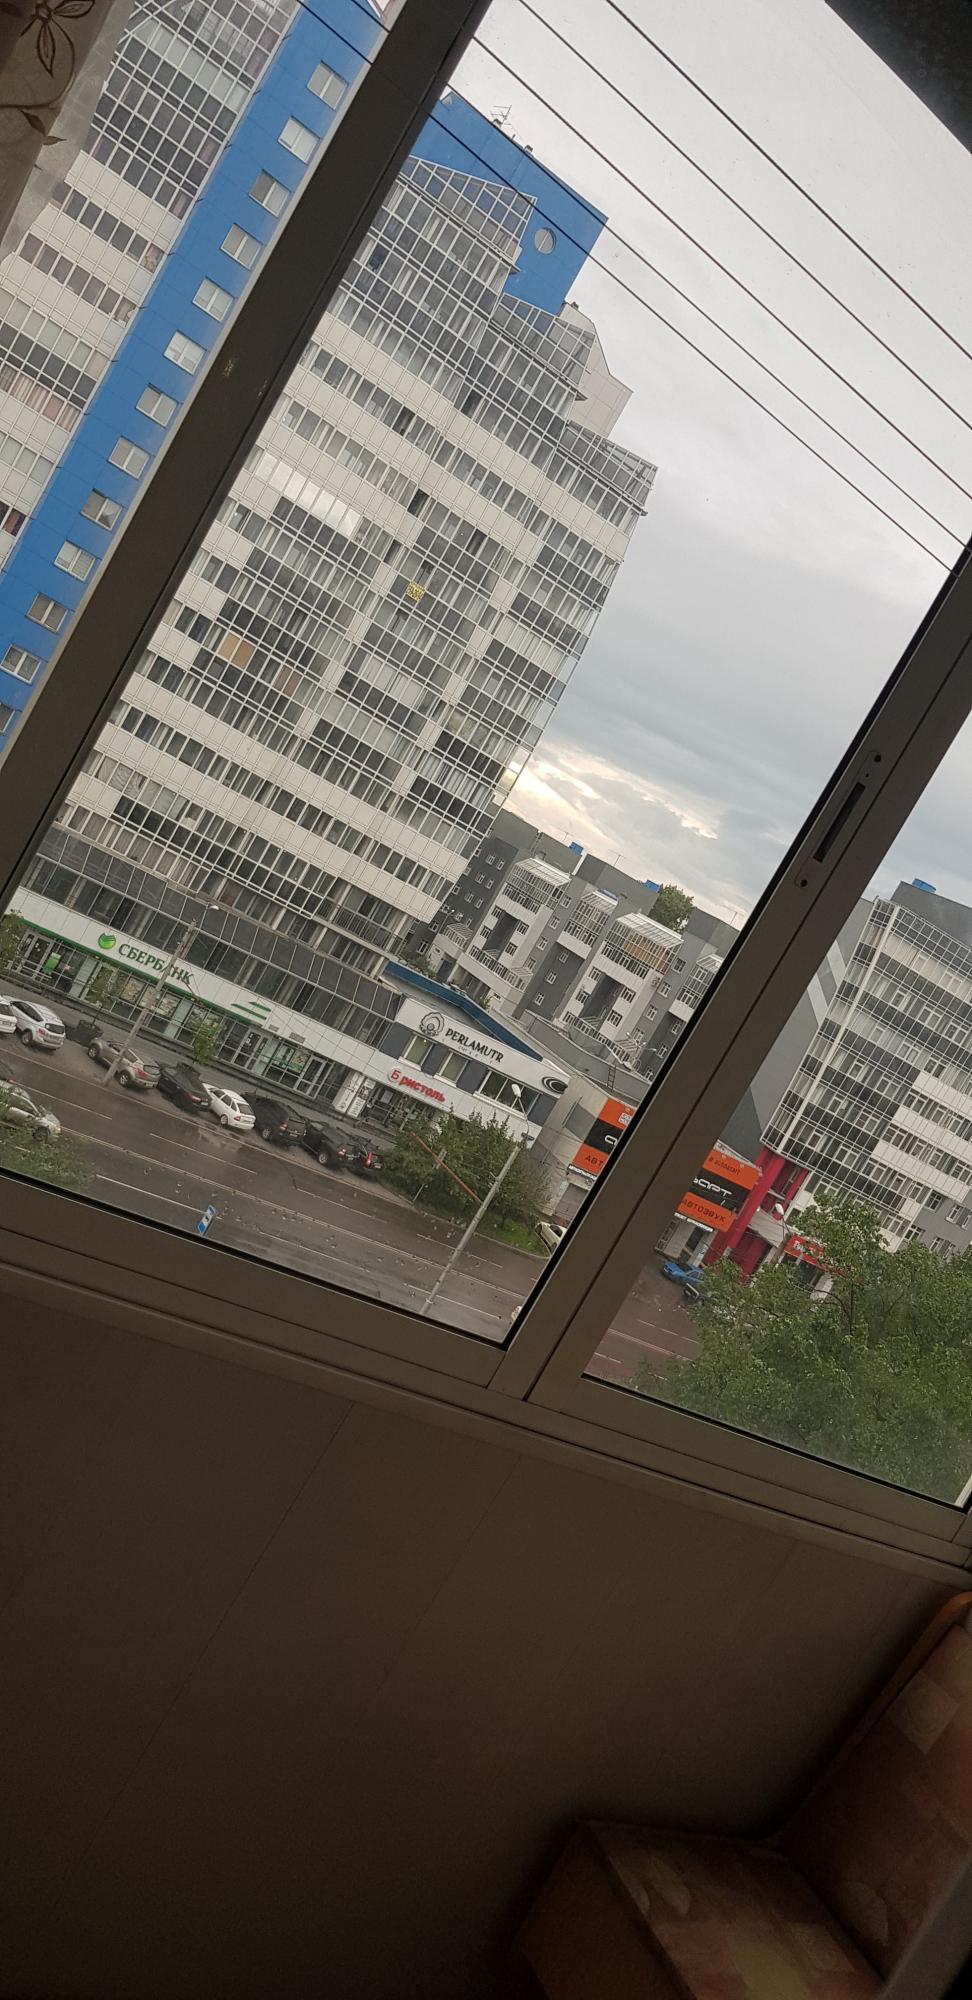 2к квартира улица Краснодарская, 3 | 18000 | аренда в Красноярске фото 19